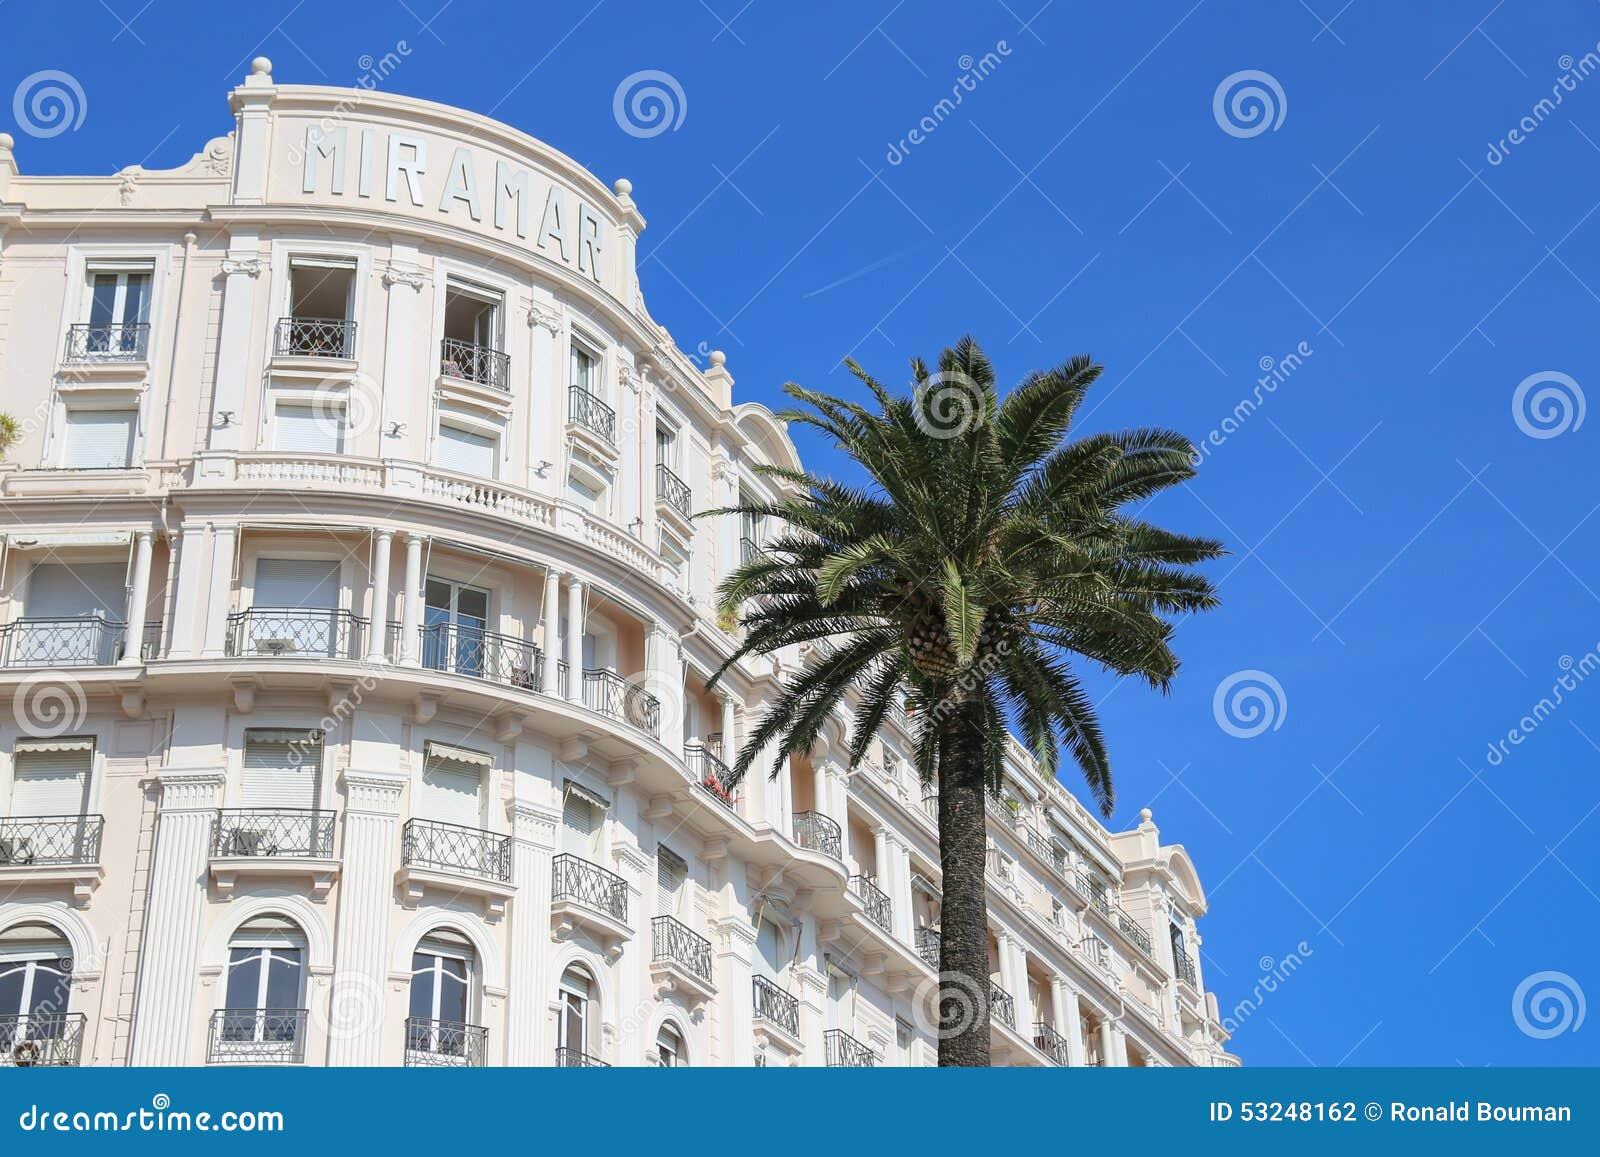 Tiara Miramar Beach Hotel Spa In Cannes Editorial Photography